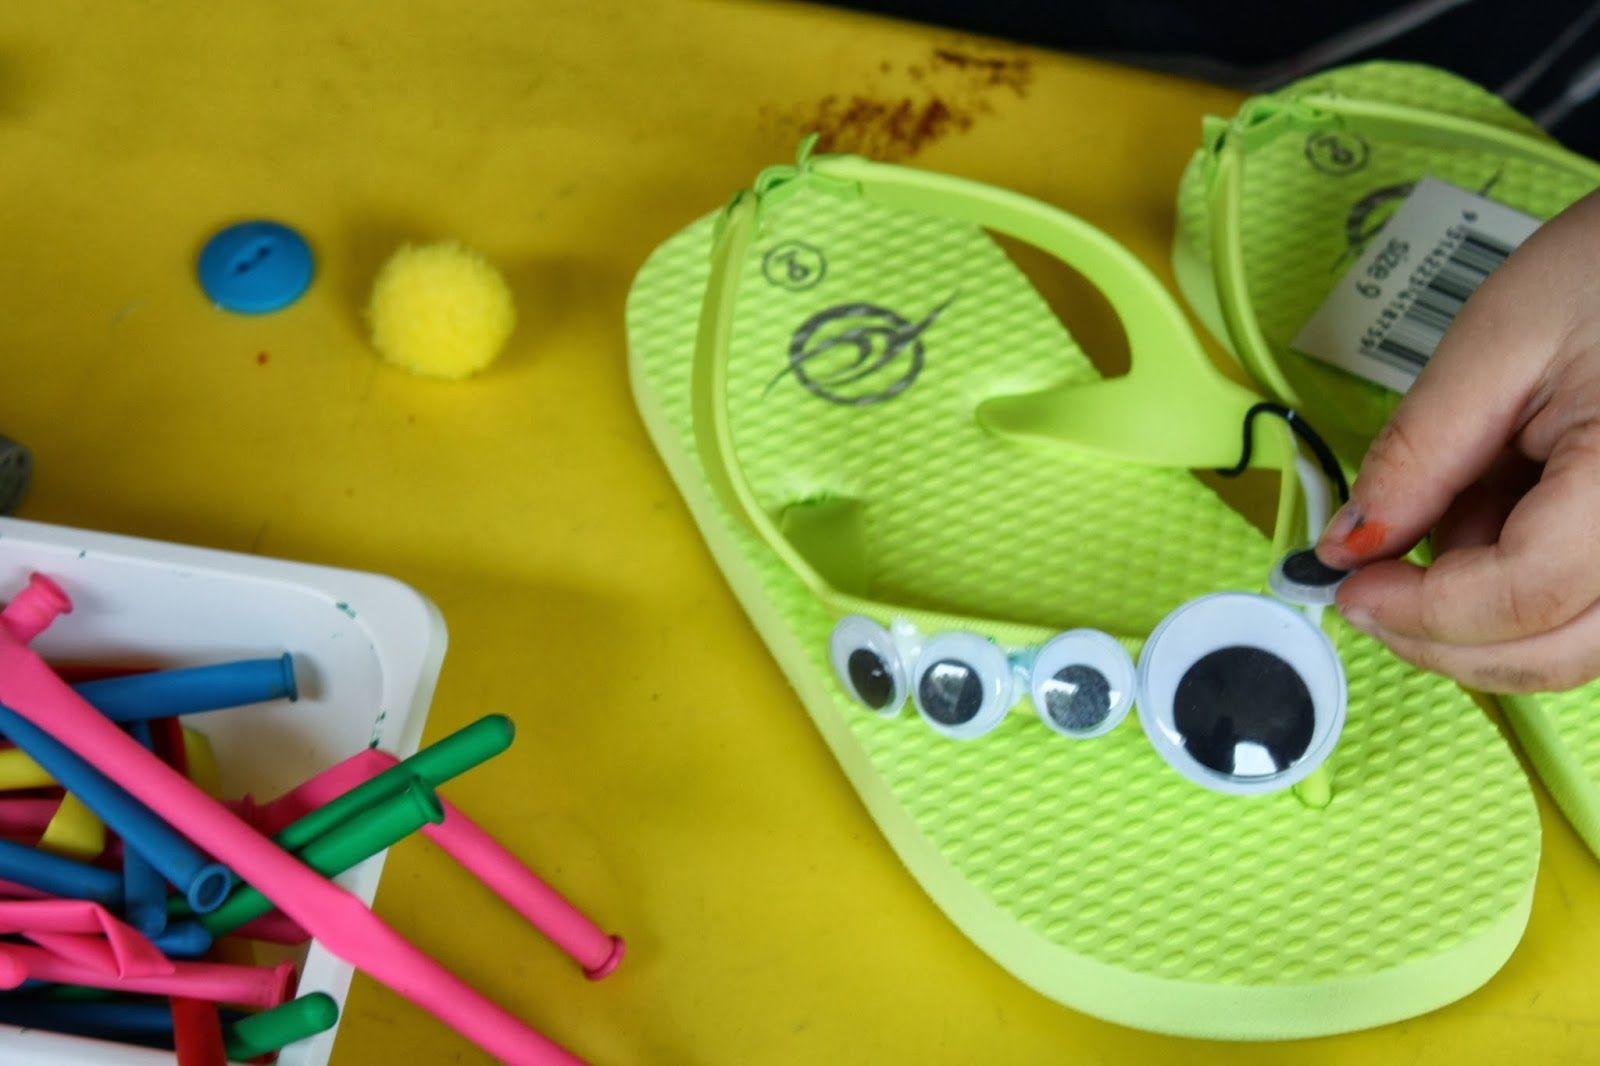 decor flop flops video xl flip flipflops ideas embellished stewart martha decorating